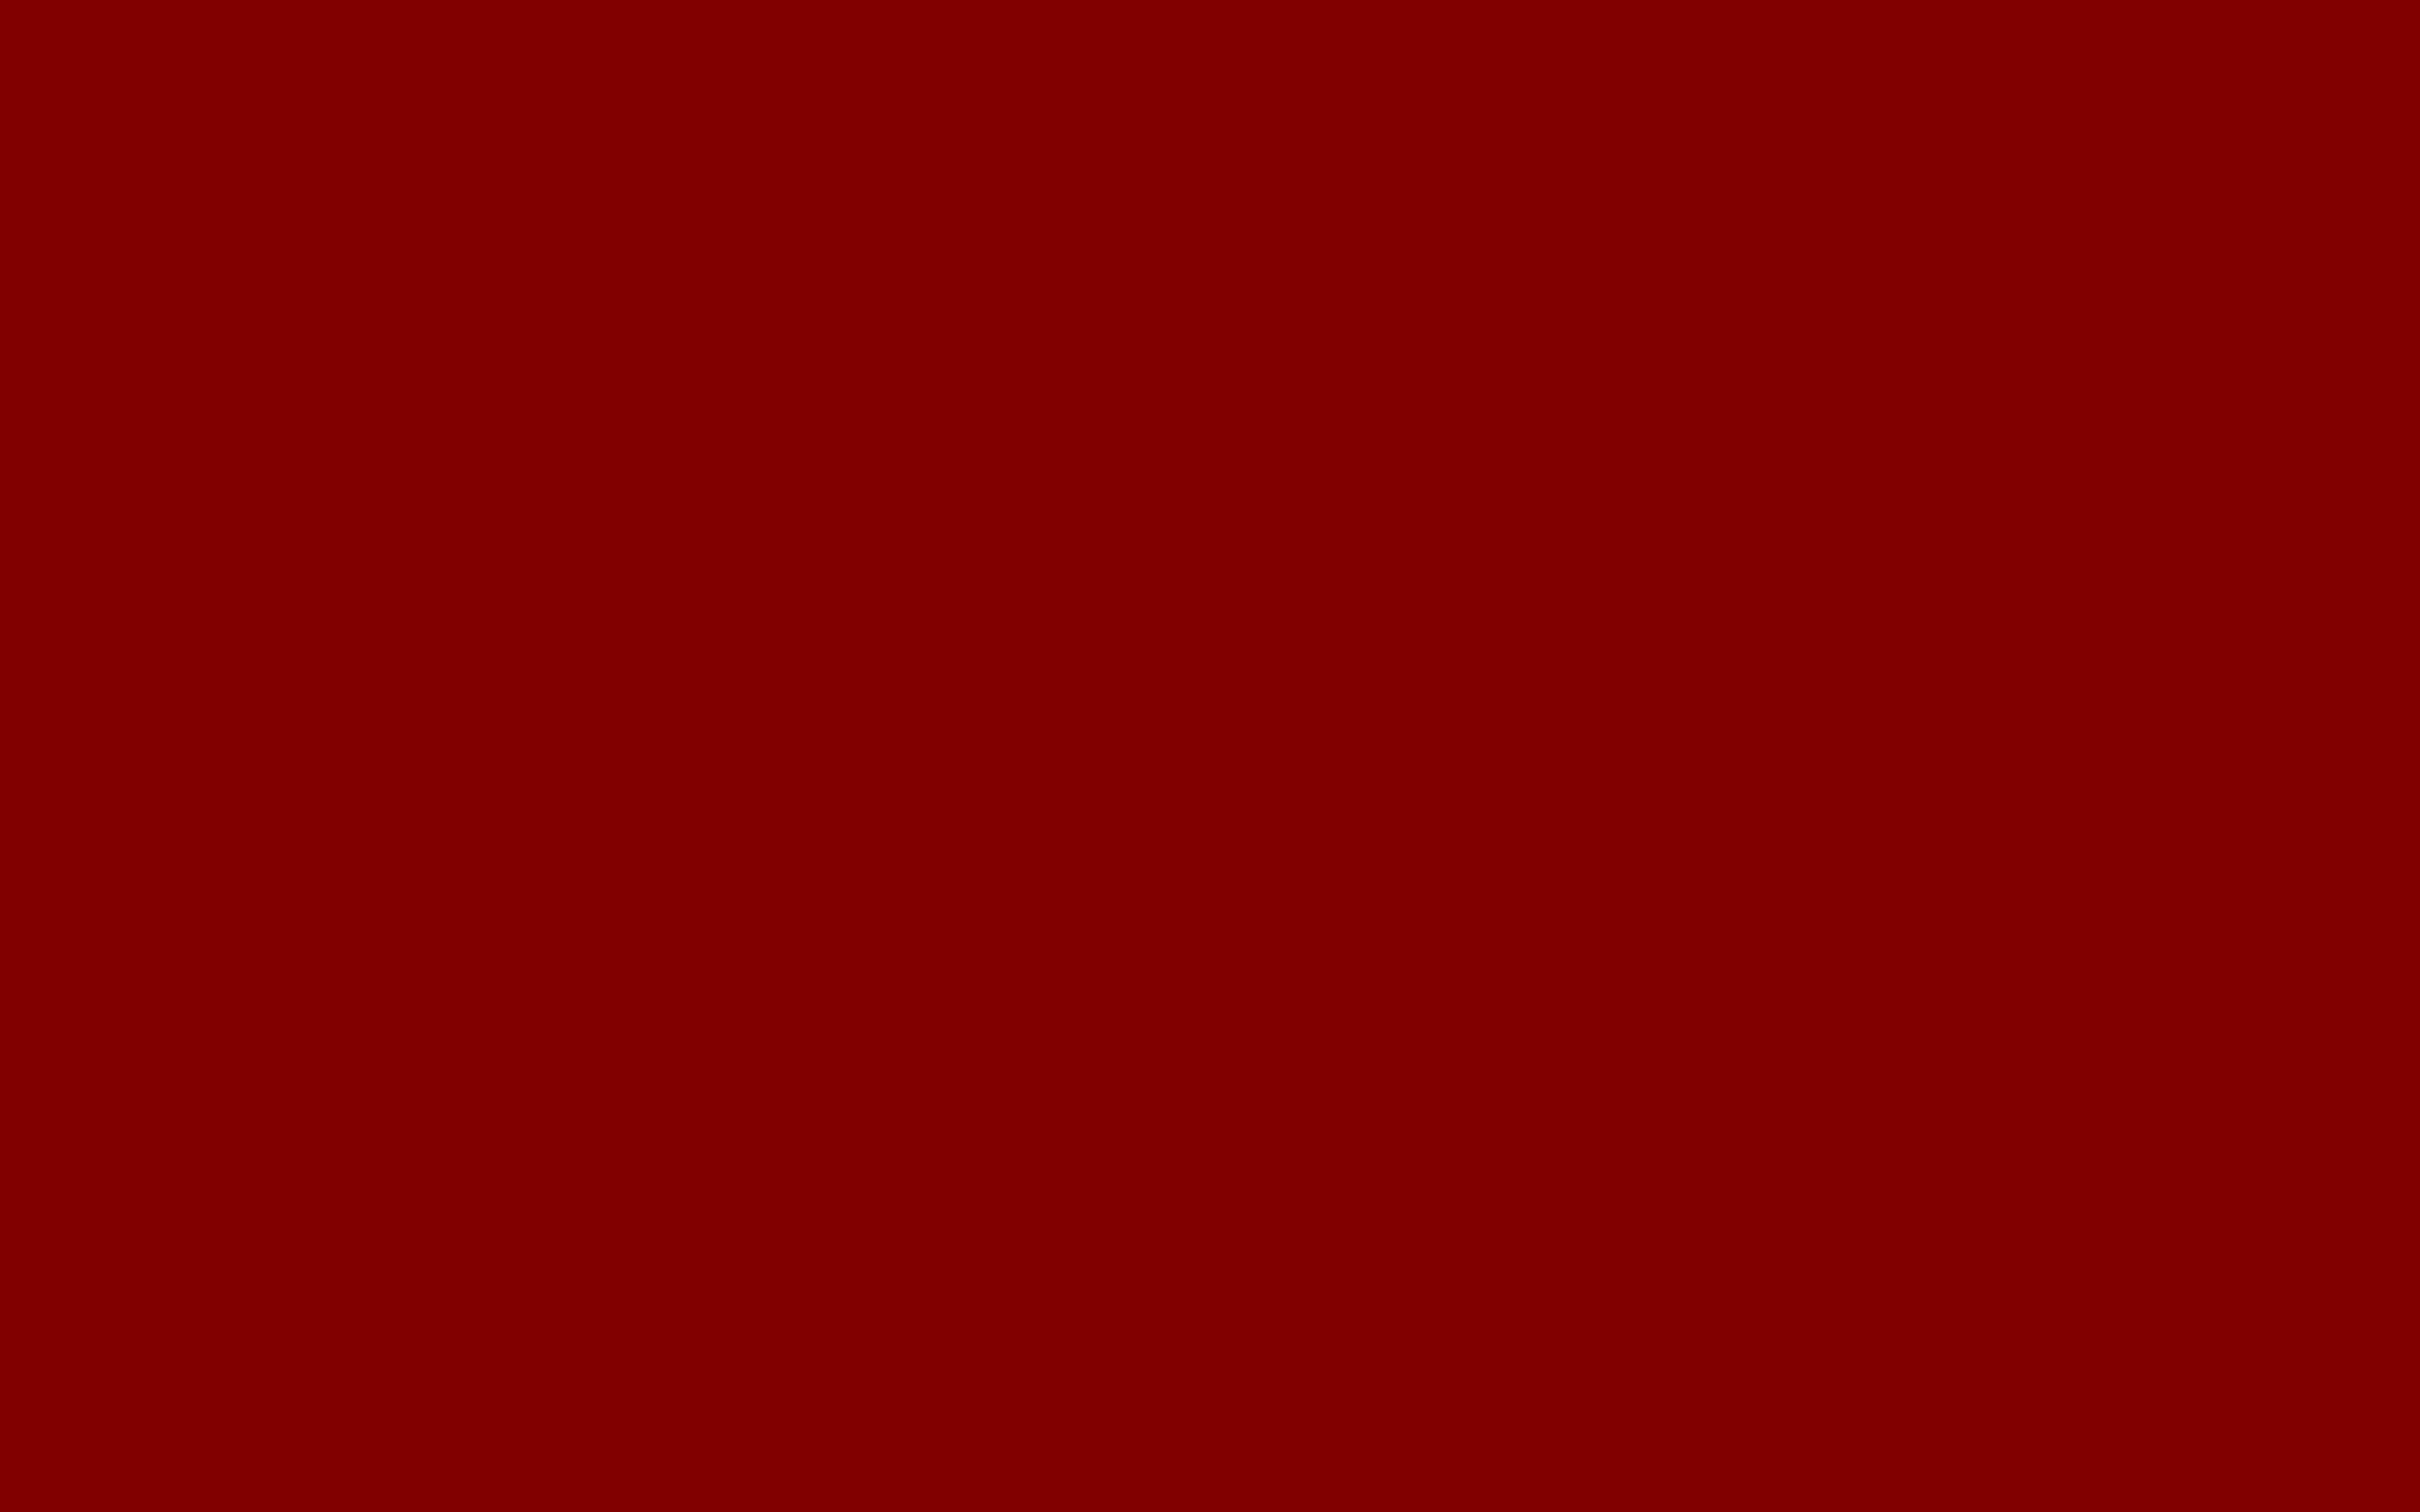 Solid Color Wallpaper 978